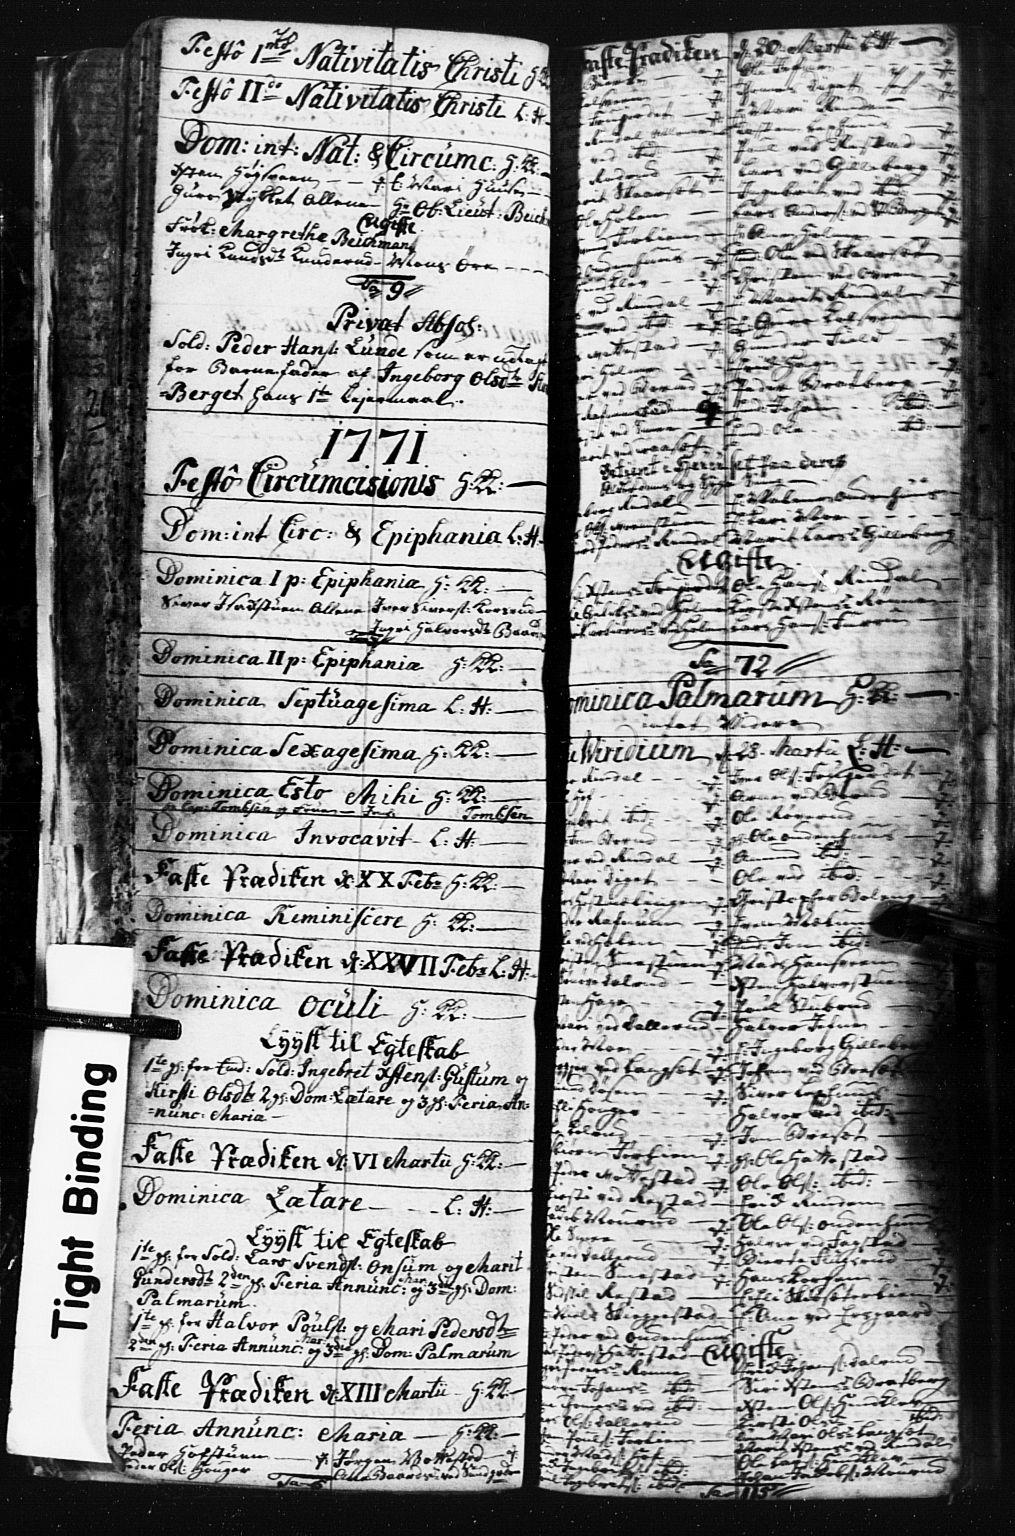 SAH, Fåberg prestekontor, Klokkerbok nr. 3, 1768-1796, s. 70-71